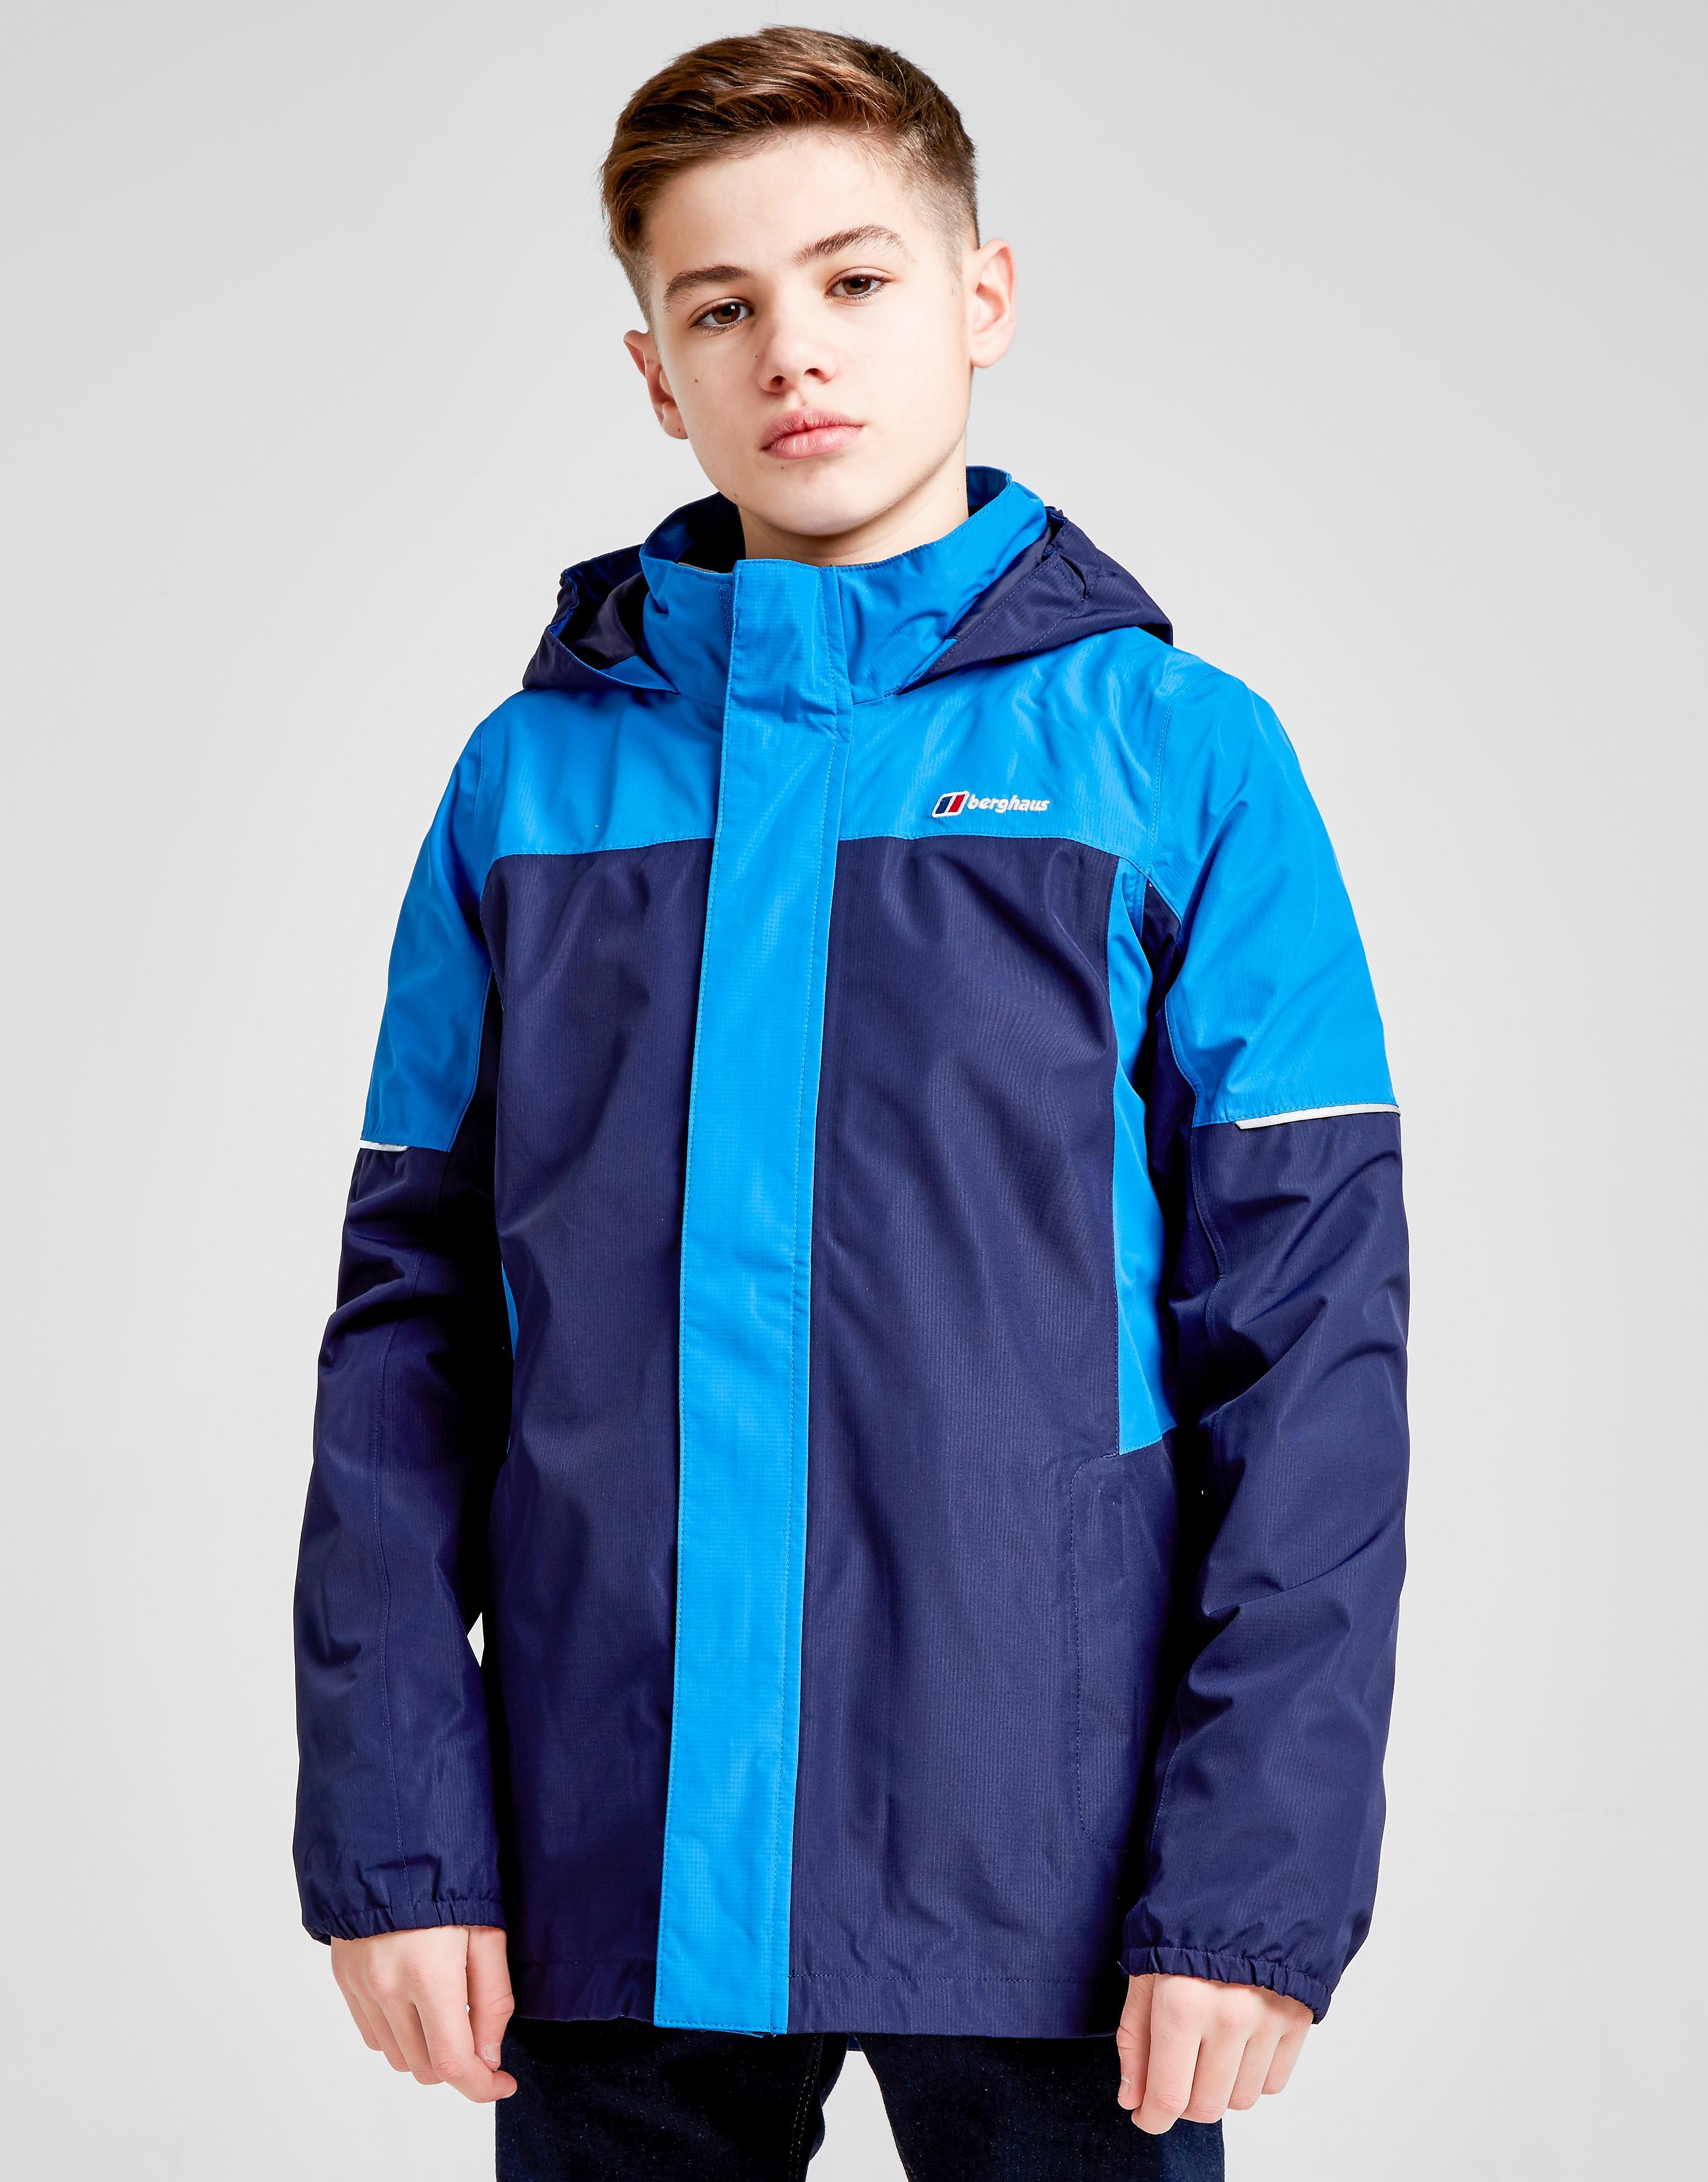 Berghaus Carrock 3-in-1 Jacket Junior